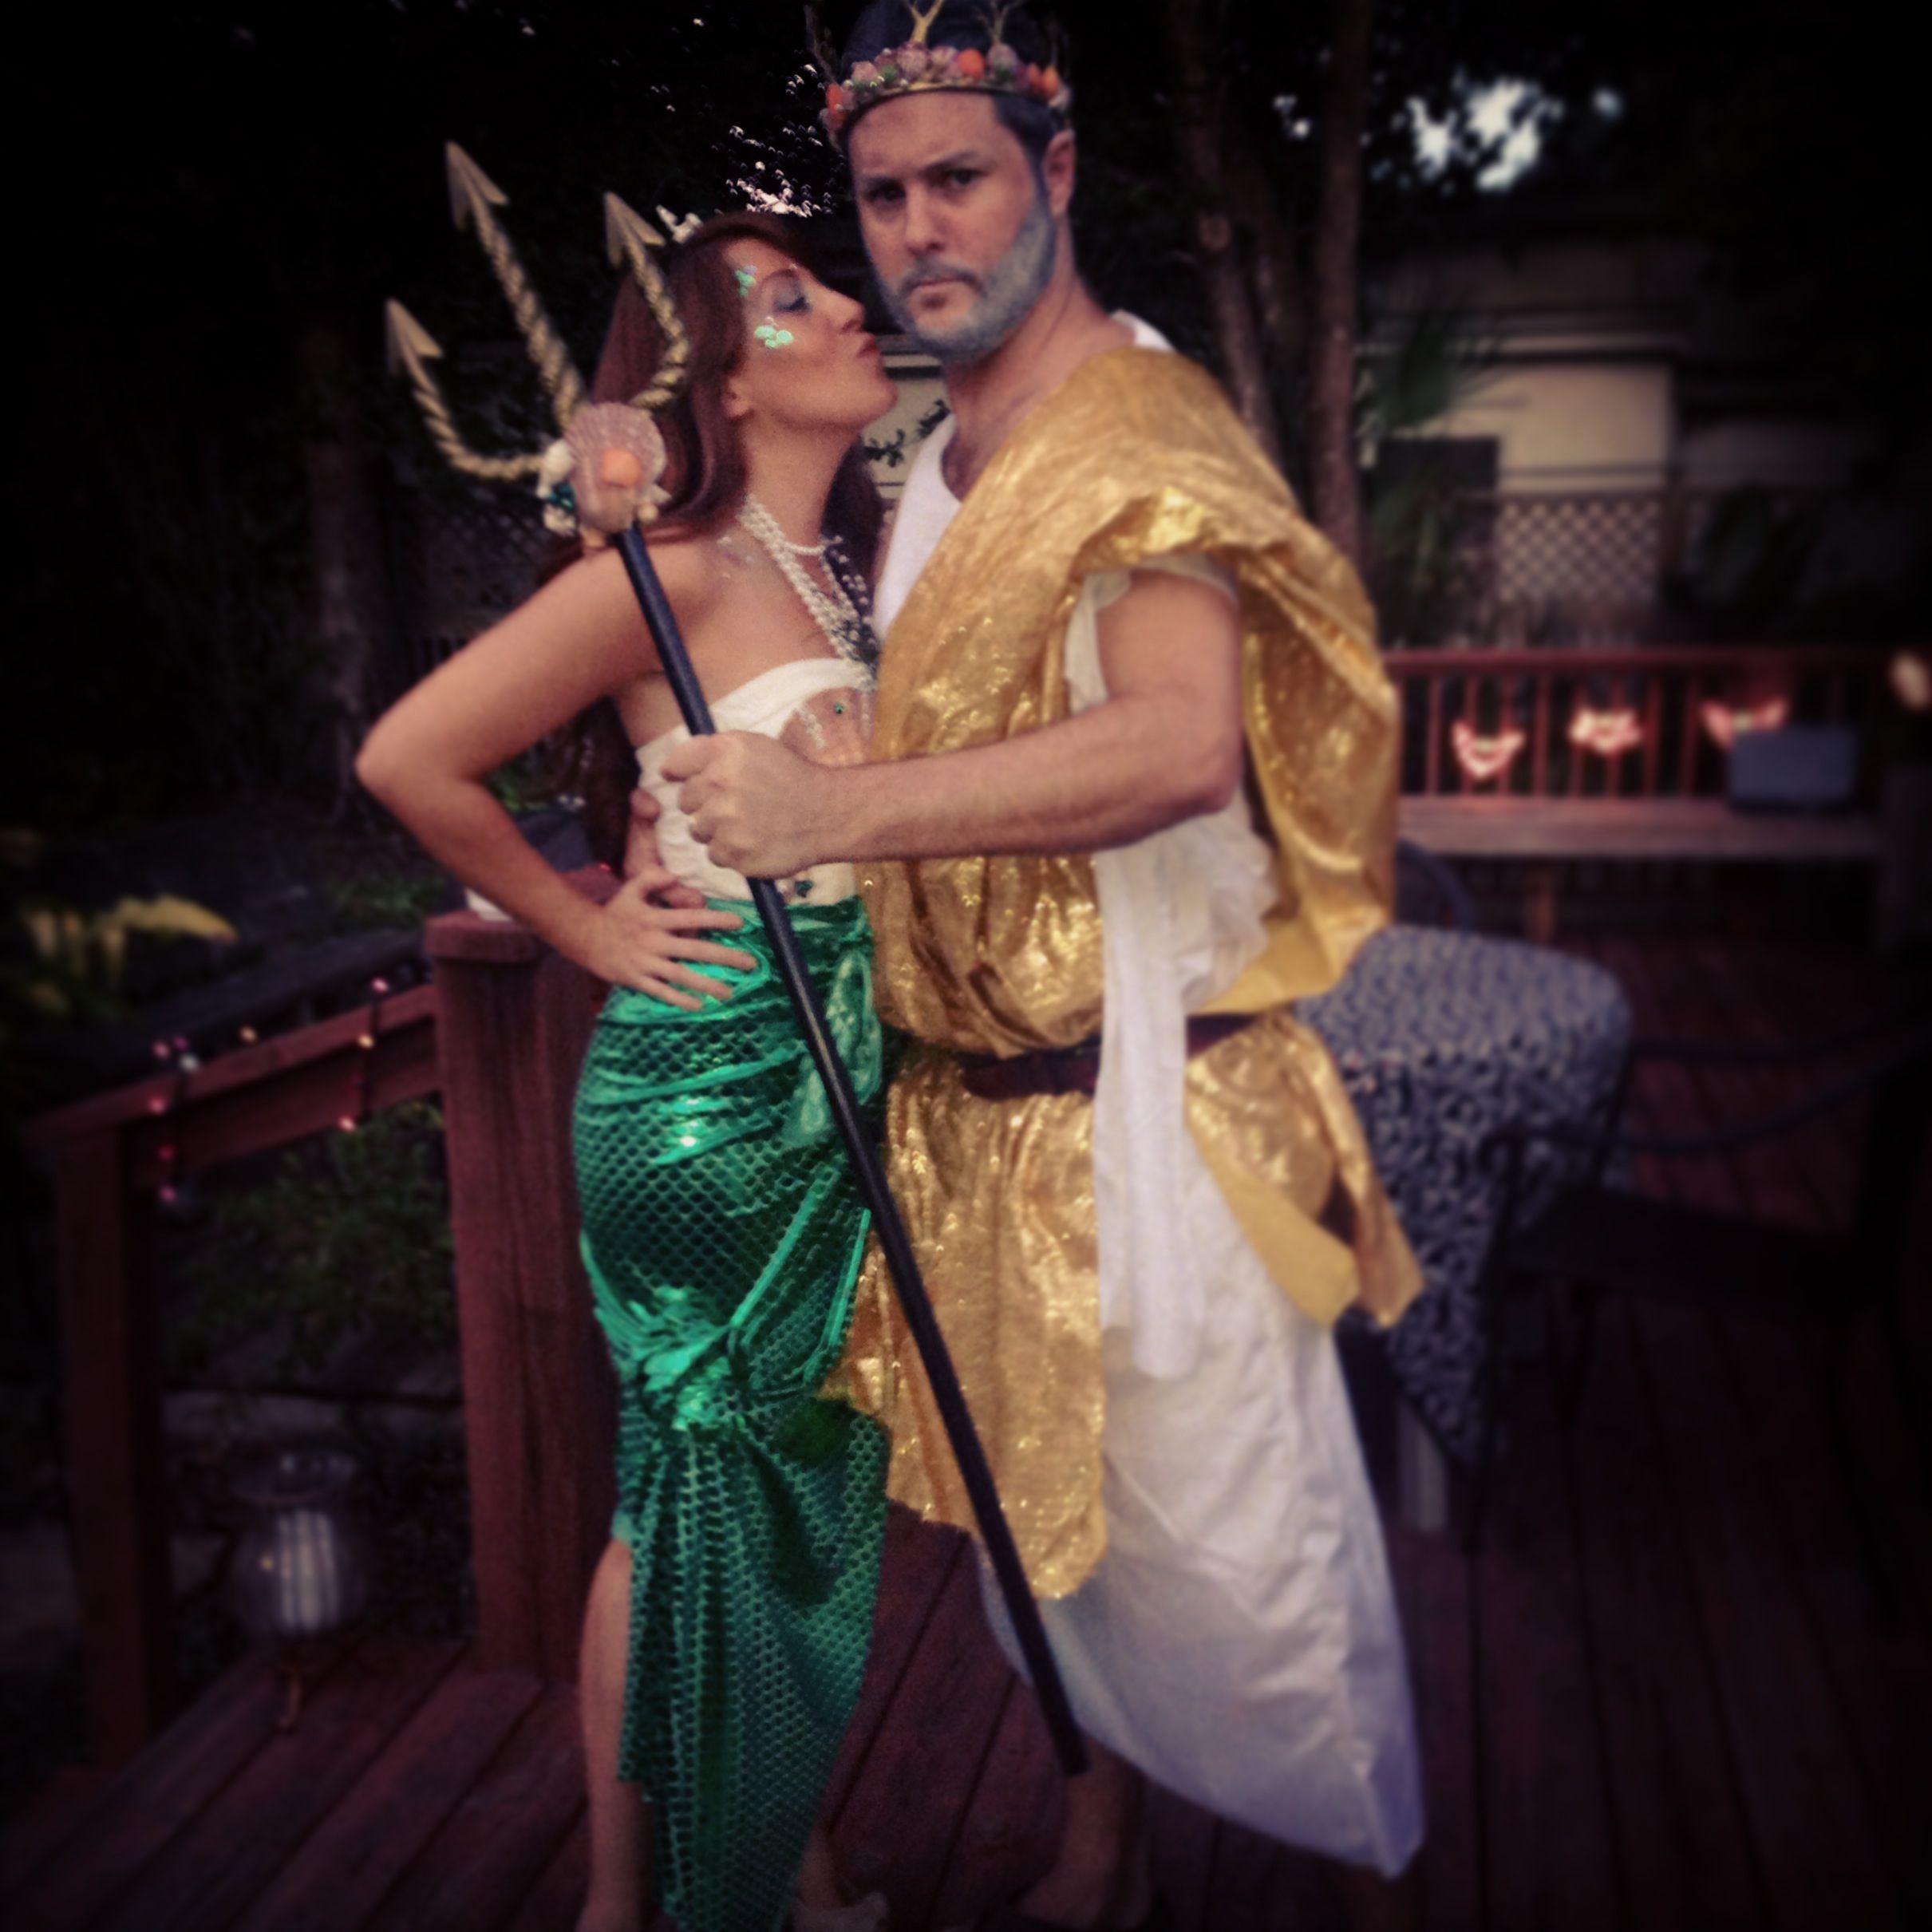 Mermaid and King Neptune costume | Halloween Costumes | Pinterest ...